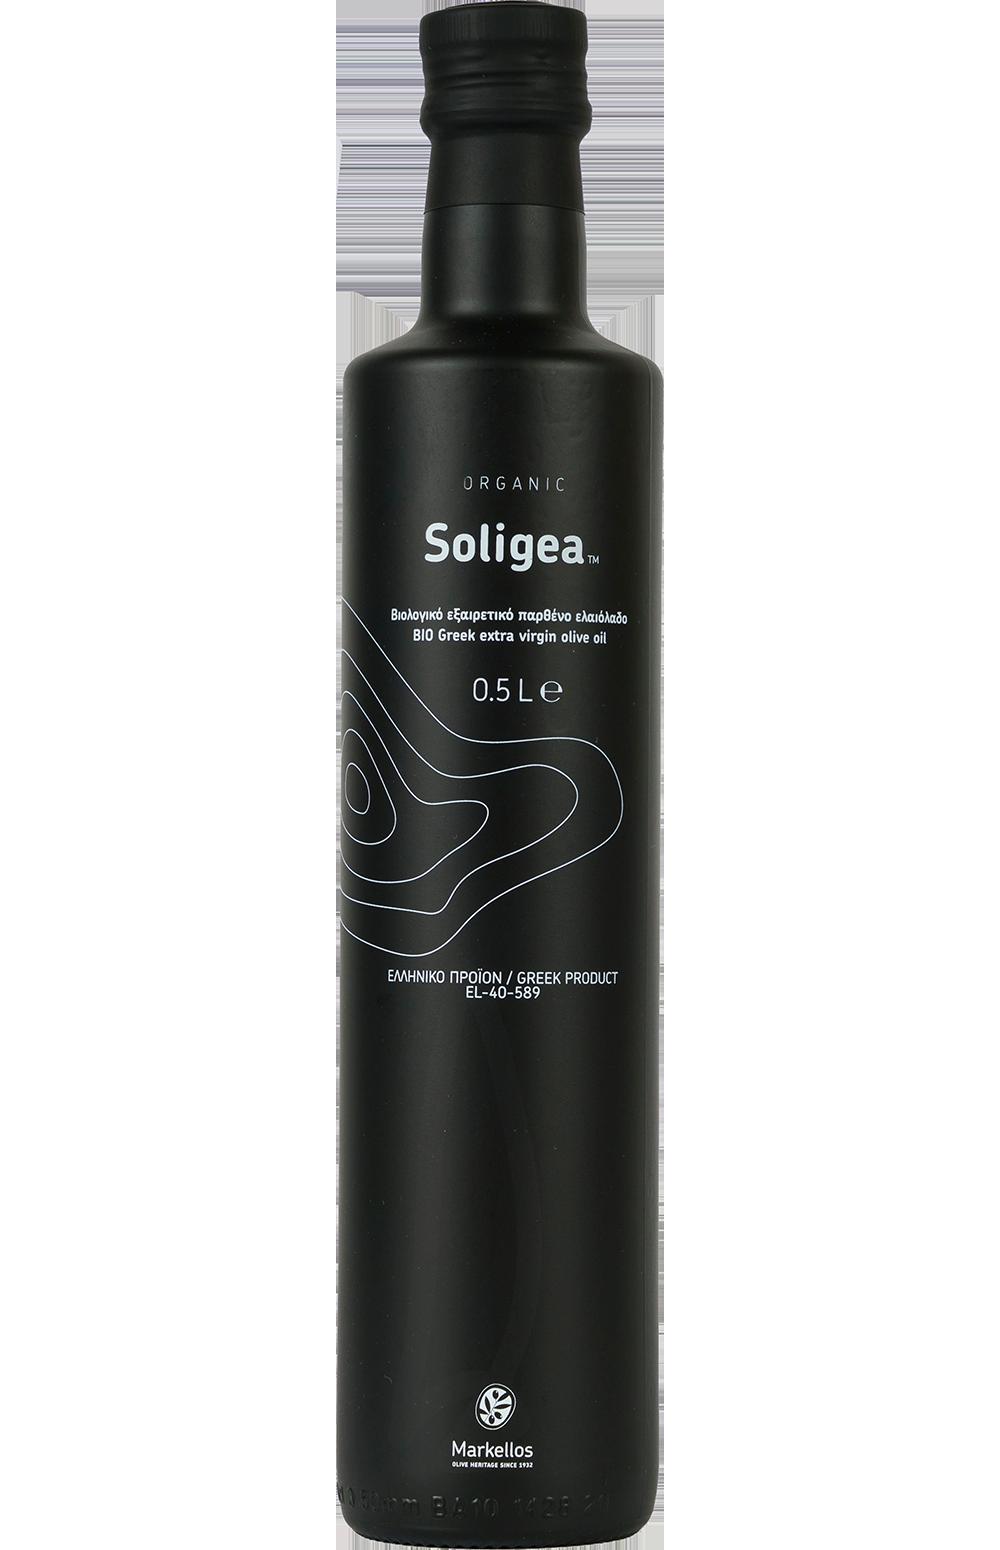 Soligea Organic